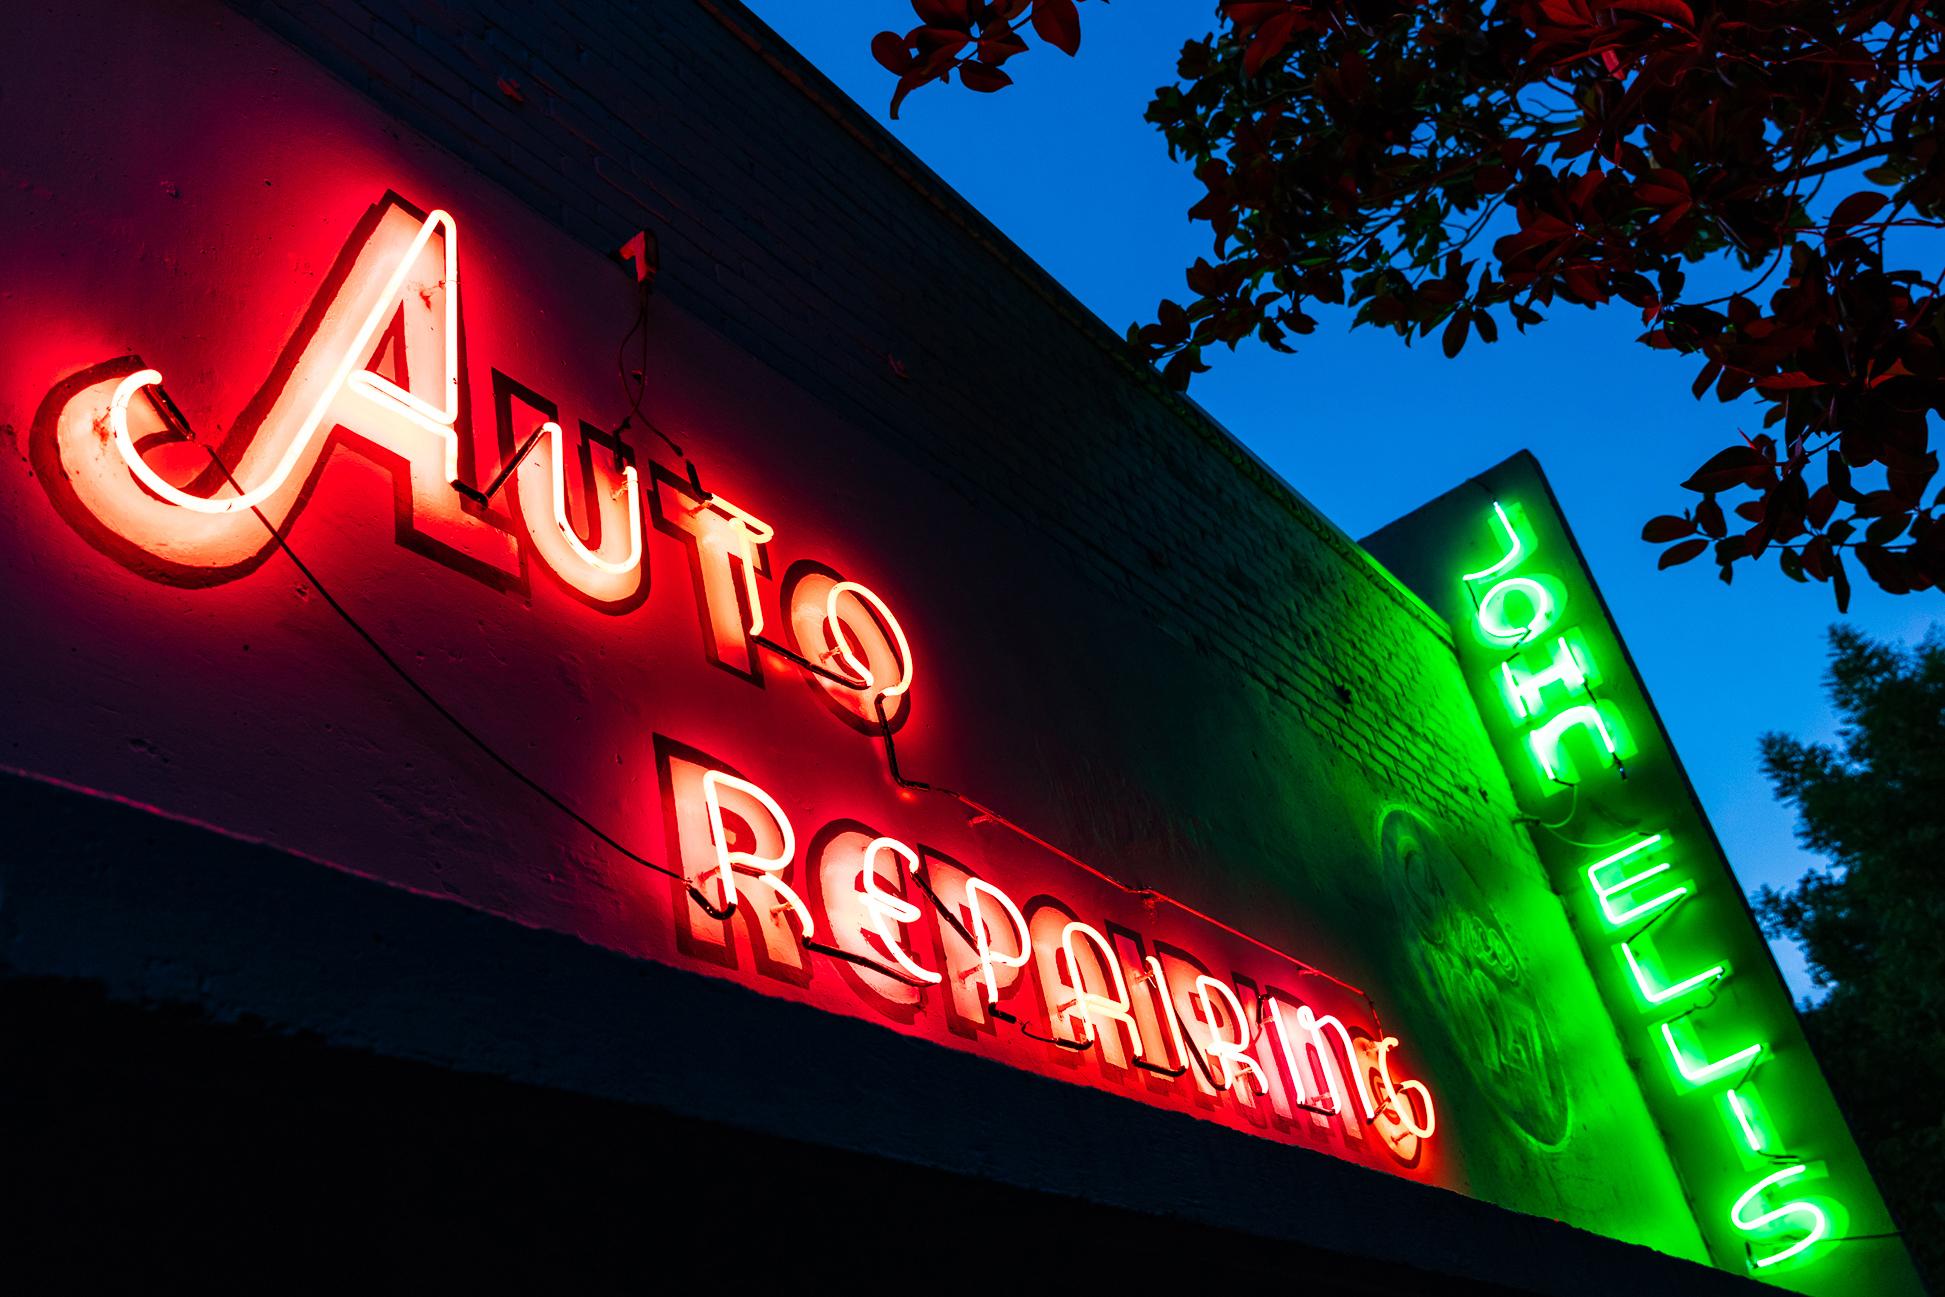 John-Ellis-And-Son-Complete-Auto-Repair-And-Maintenance-Sacramento-CA-Neon.jpg